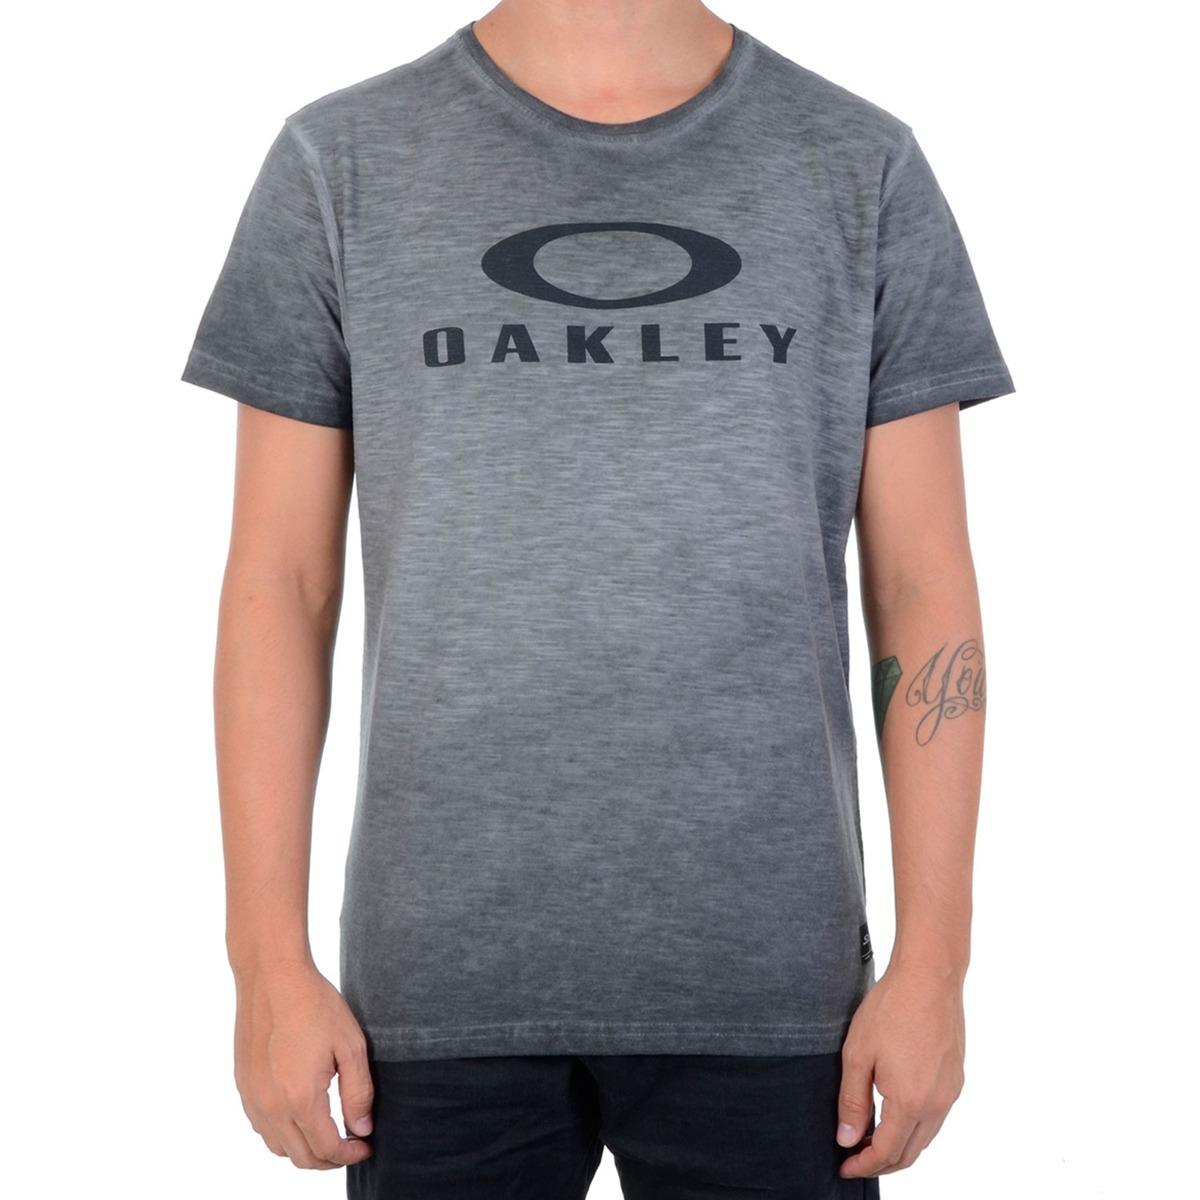 ea18092c884c1 Camiseta Masculina Oakley Especial Brand Sp Chumbo - R  98,00 em ...